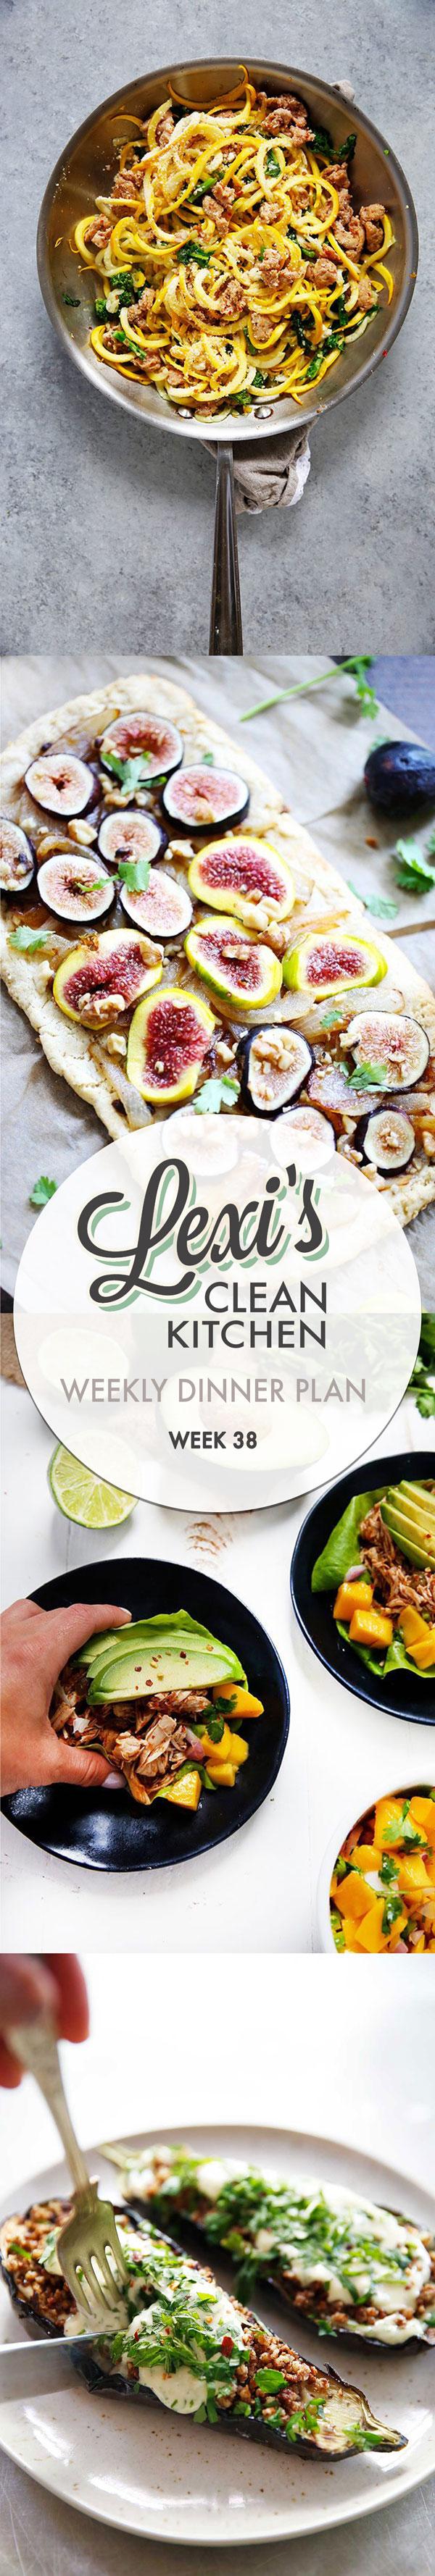 Weekly Dinner Plan Week 38 | Lexi's Clean Kitchen